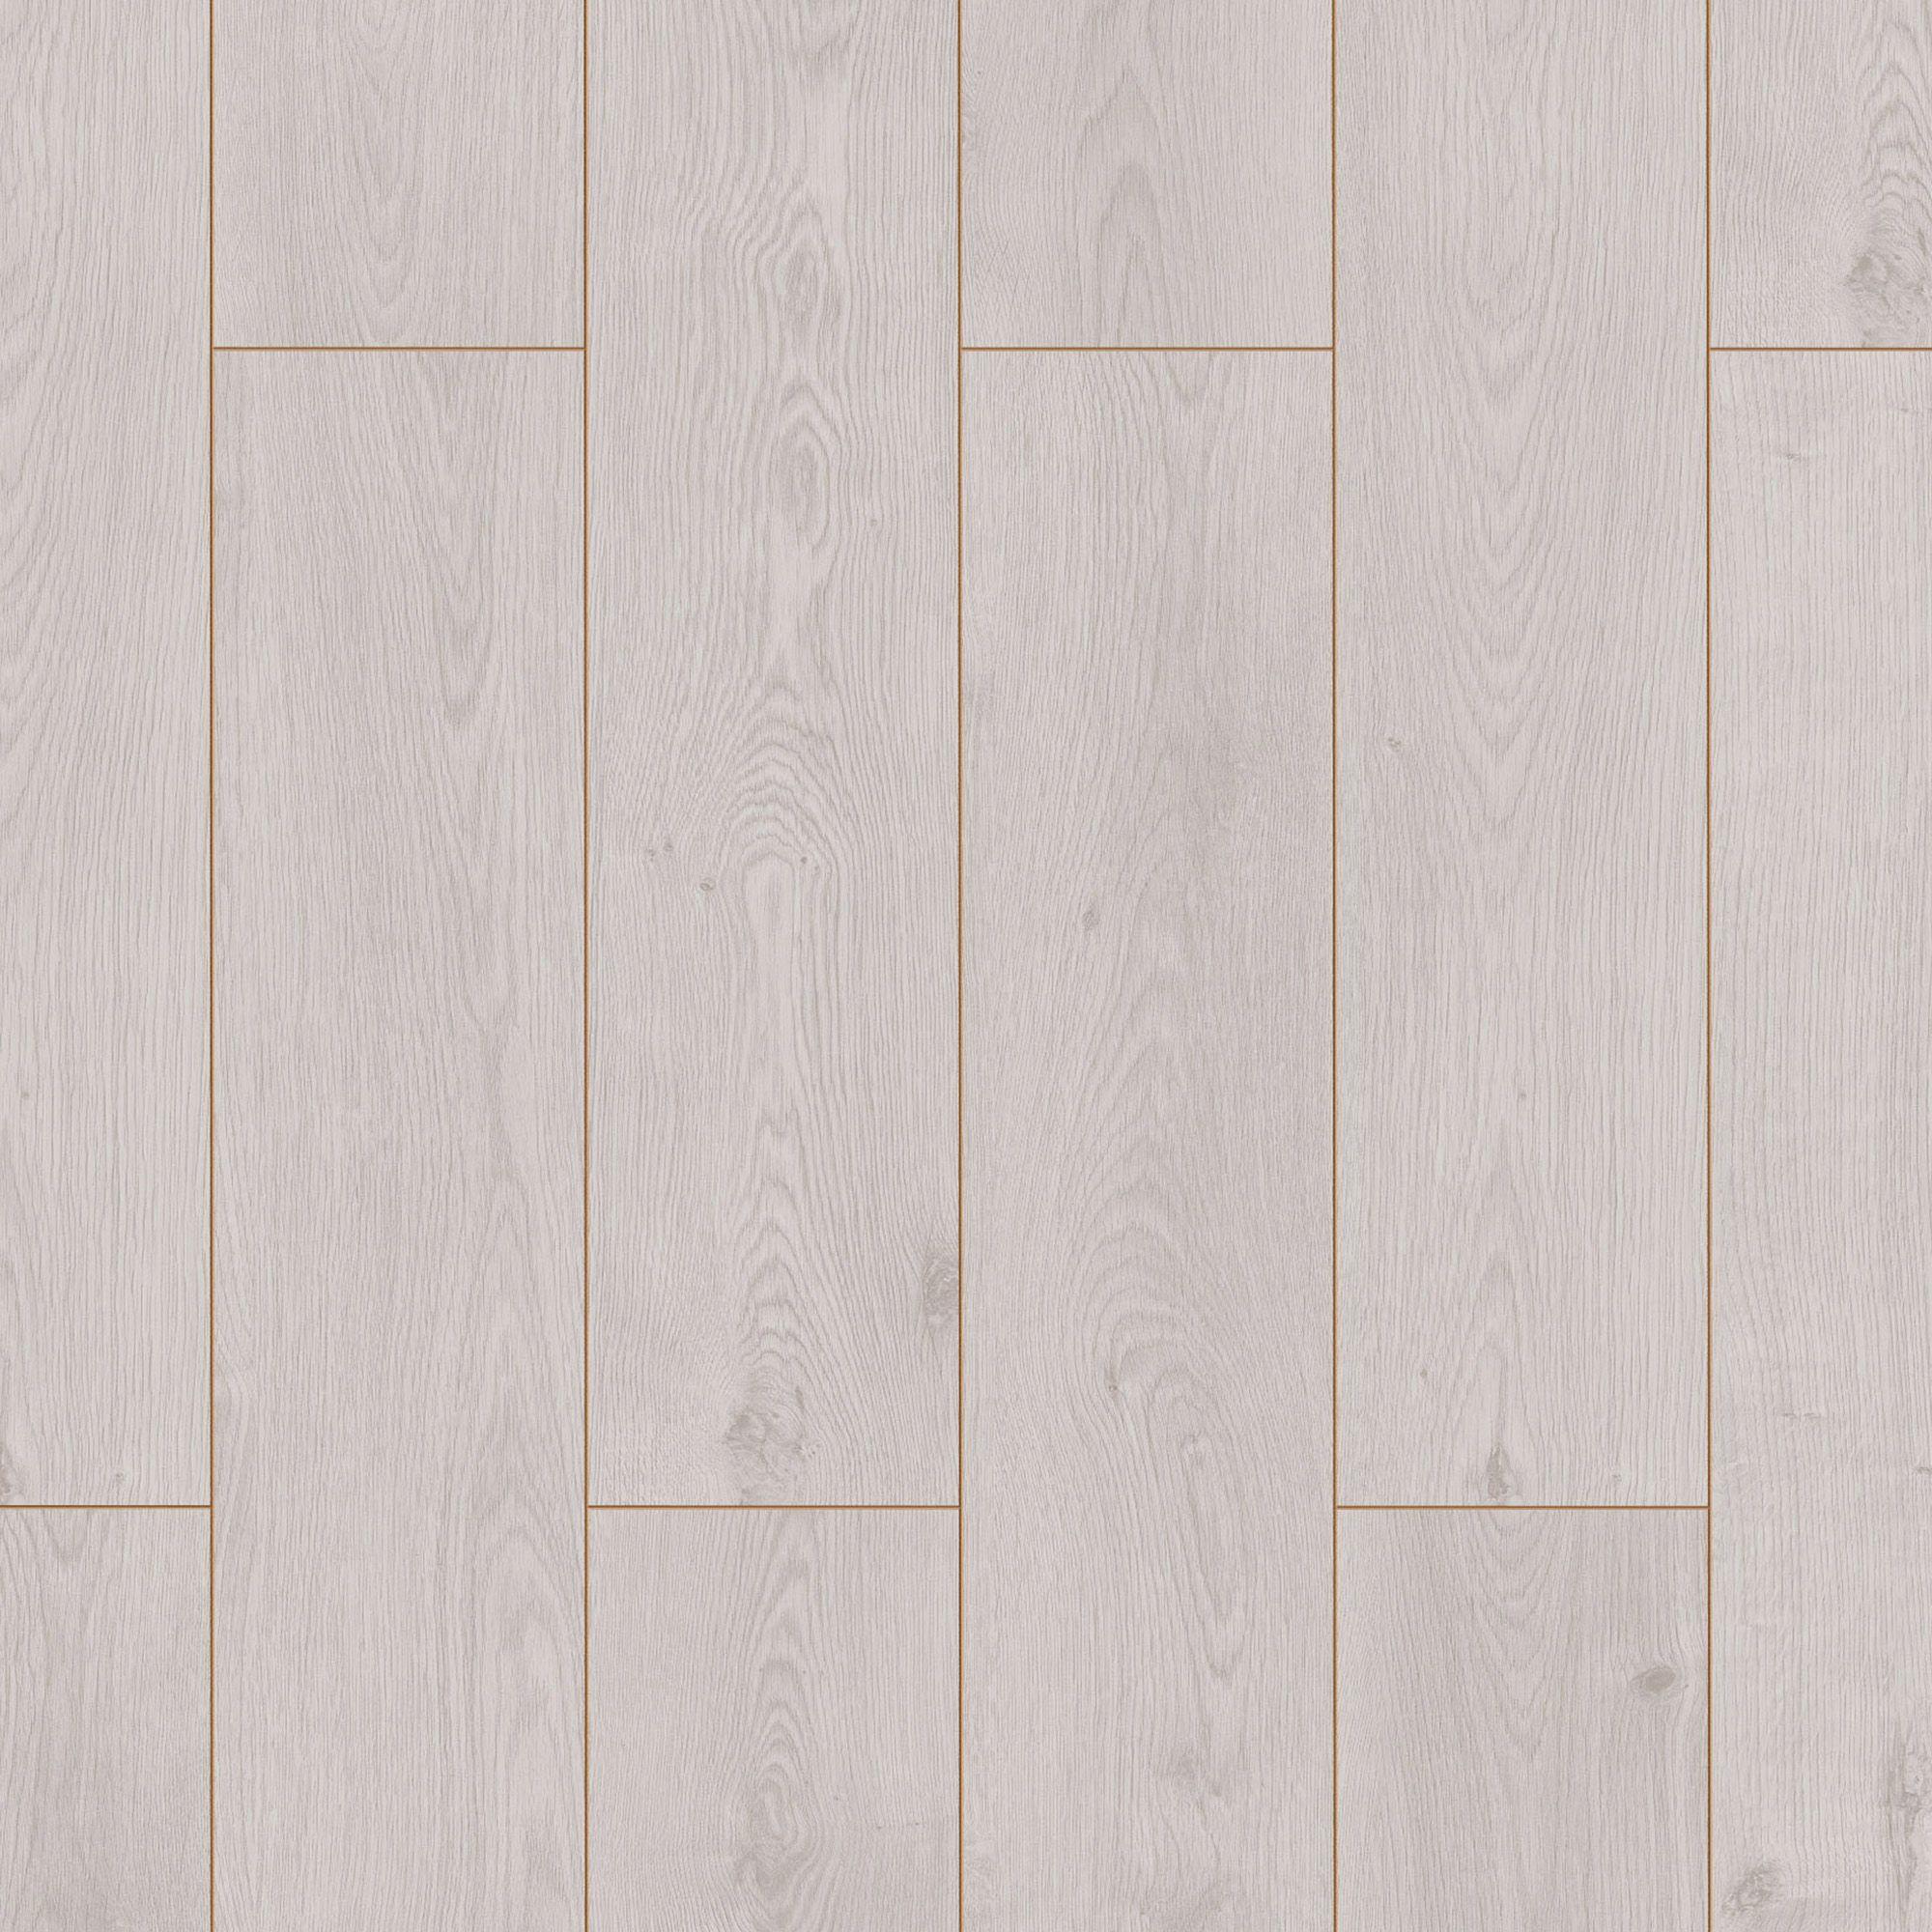 Overture Arlington White Oak Effect Laminate Flooring 1 25 M² Sample Departments Diy At B Q